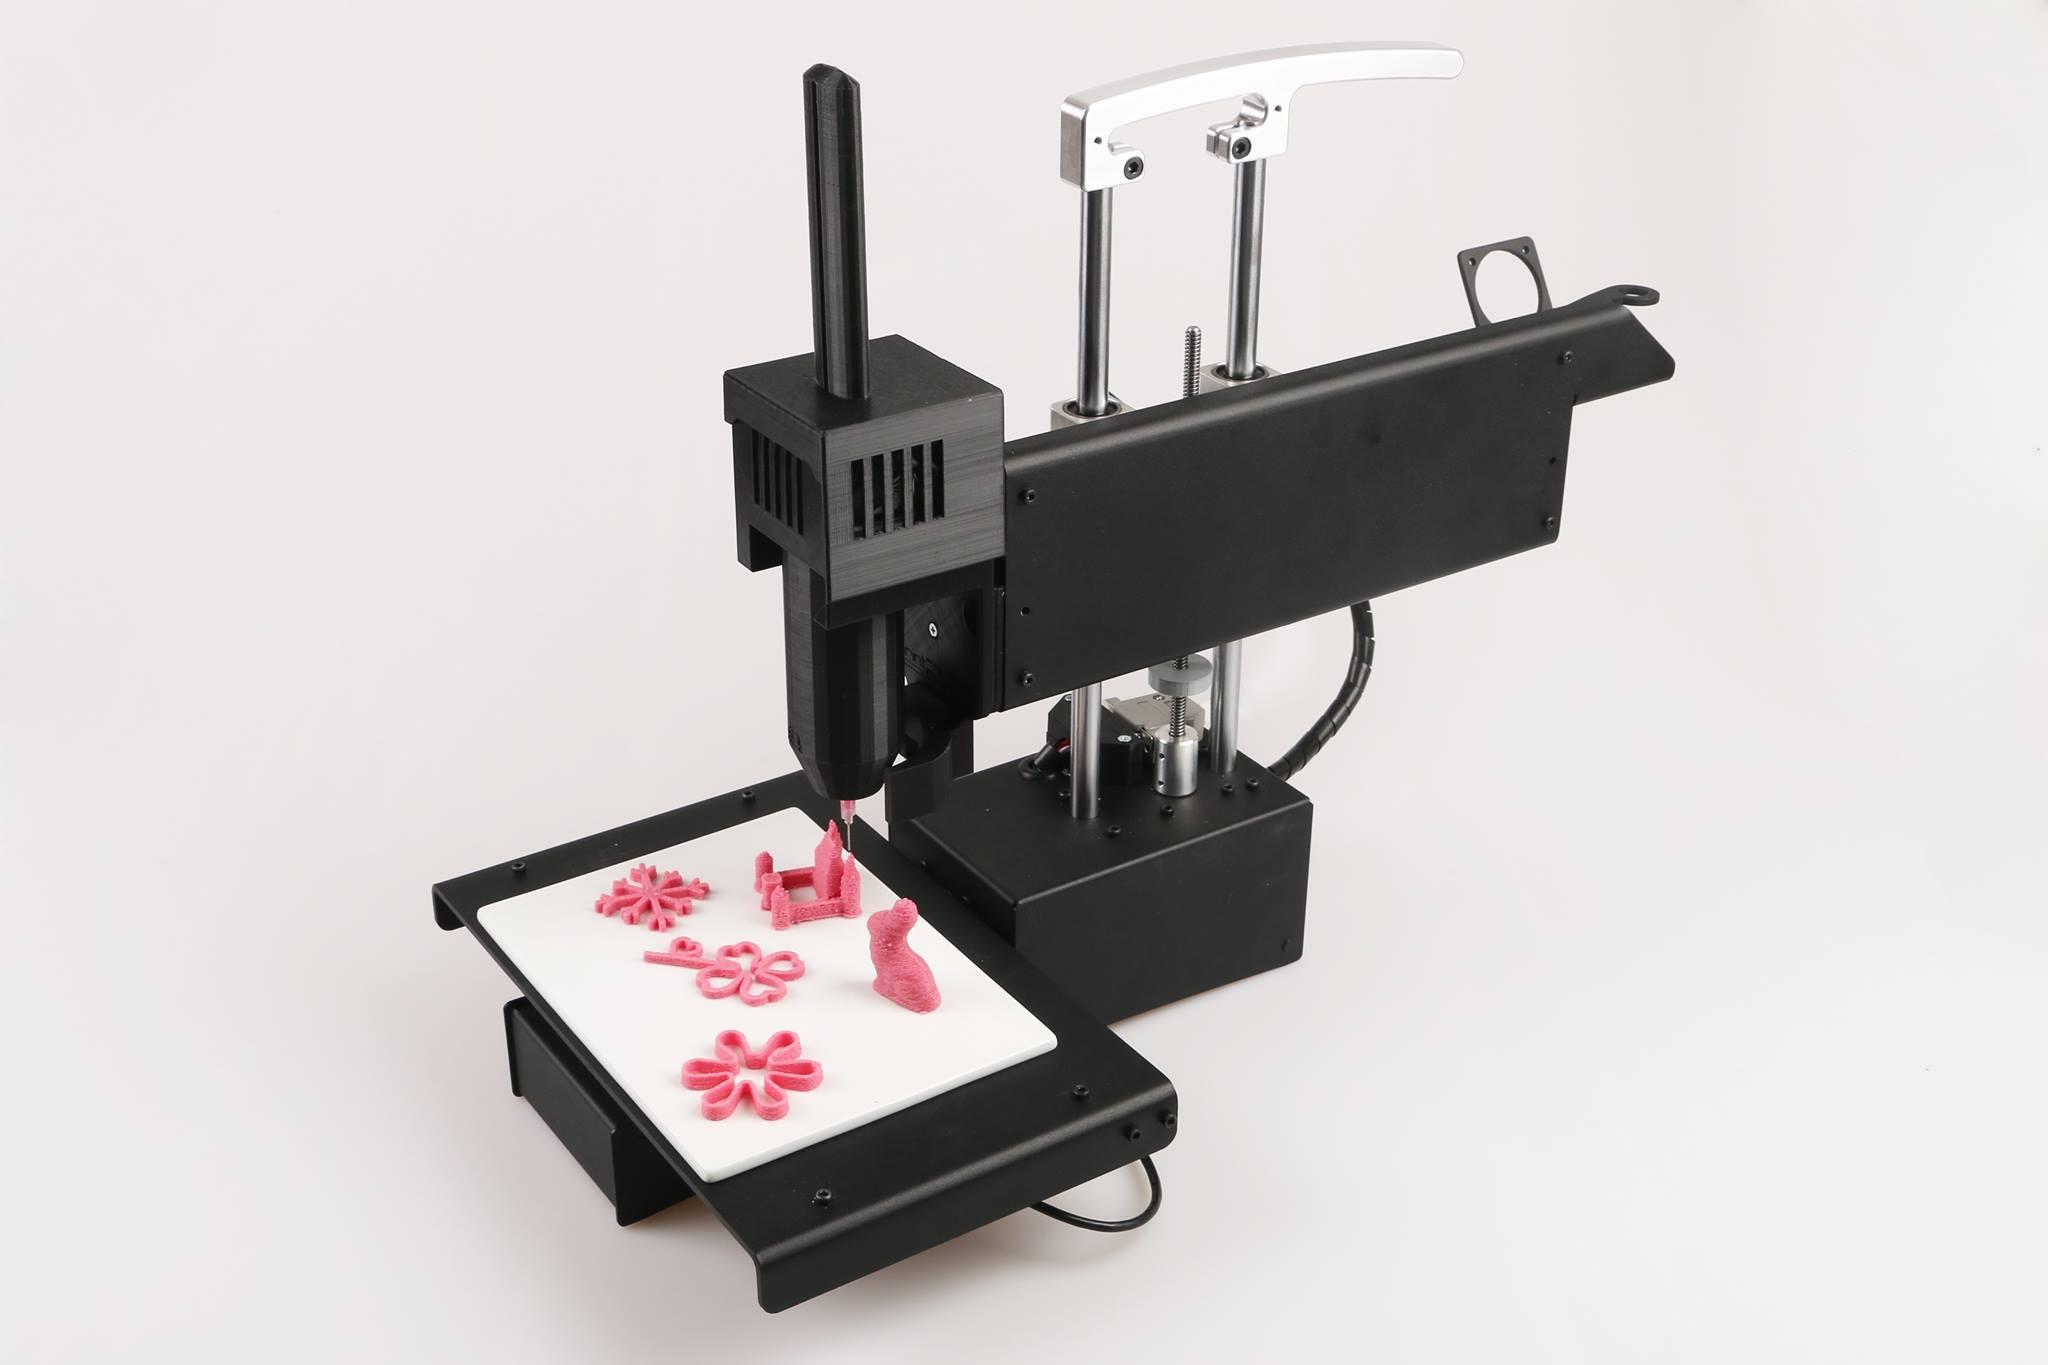 D Printing Exhibition Usa : Forget plastic — this d printer retrofit makes it